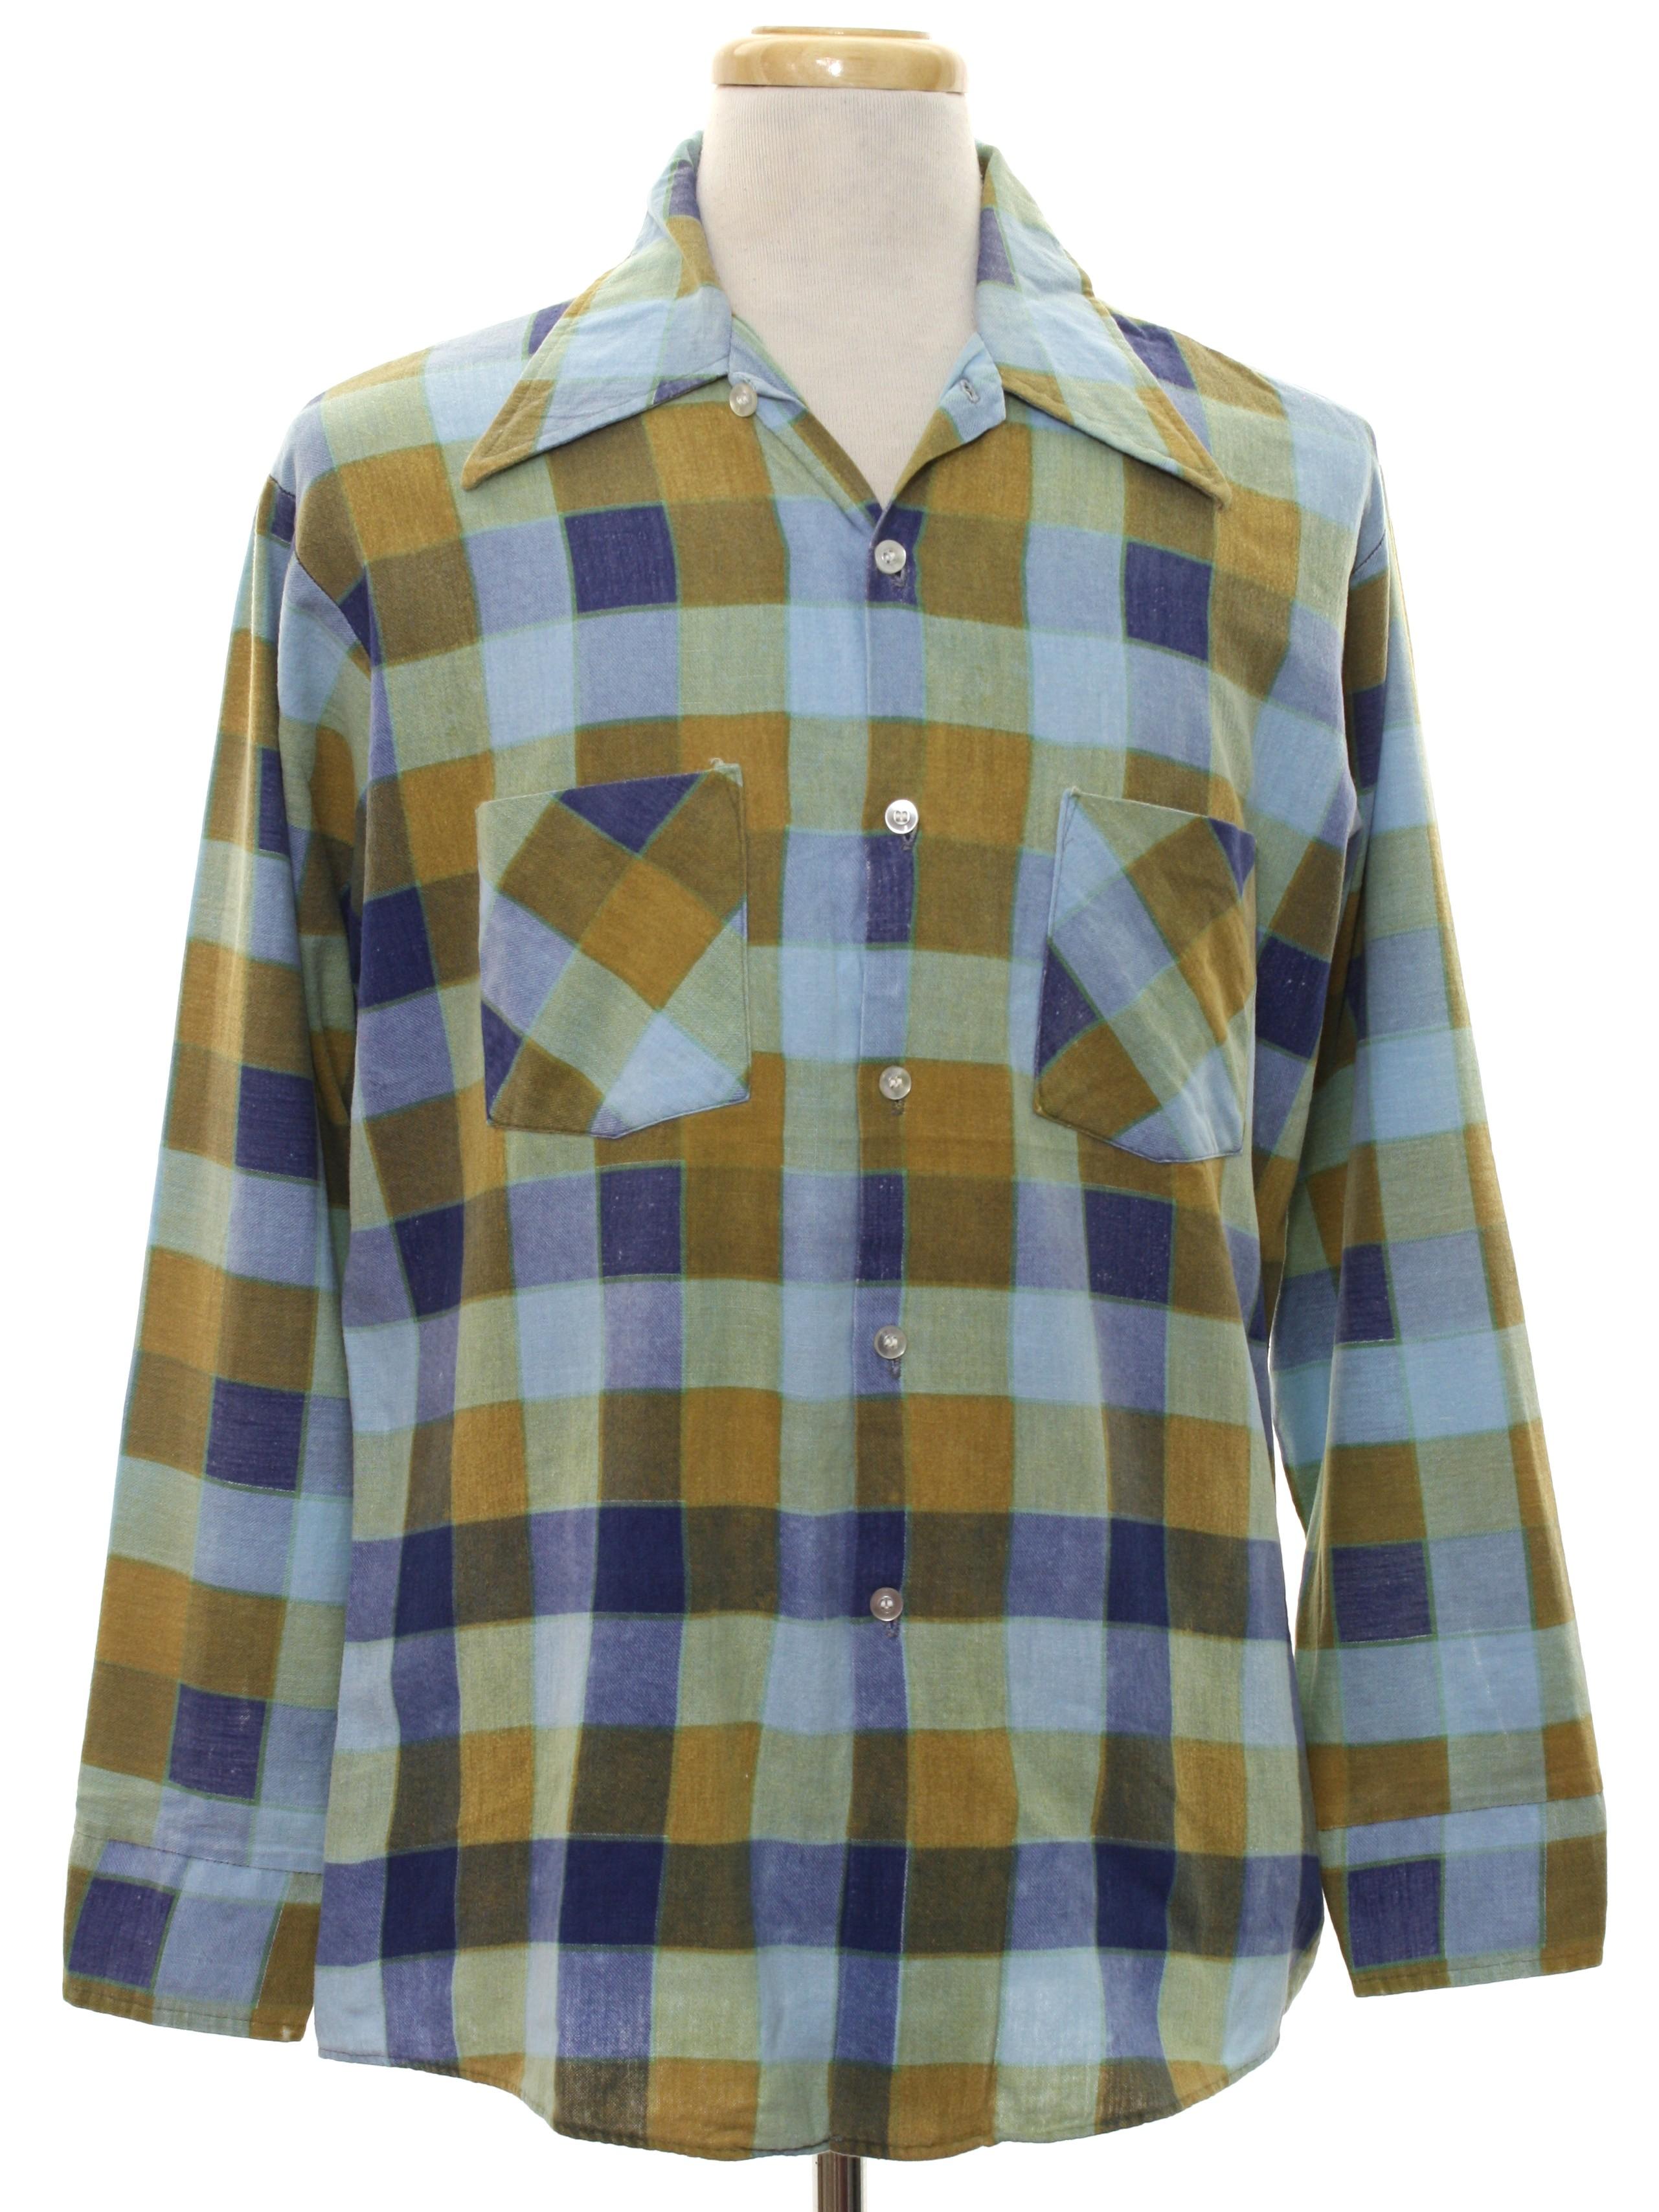 1960s Vintage Shirt 60s Mohawk Mens Light Blue